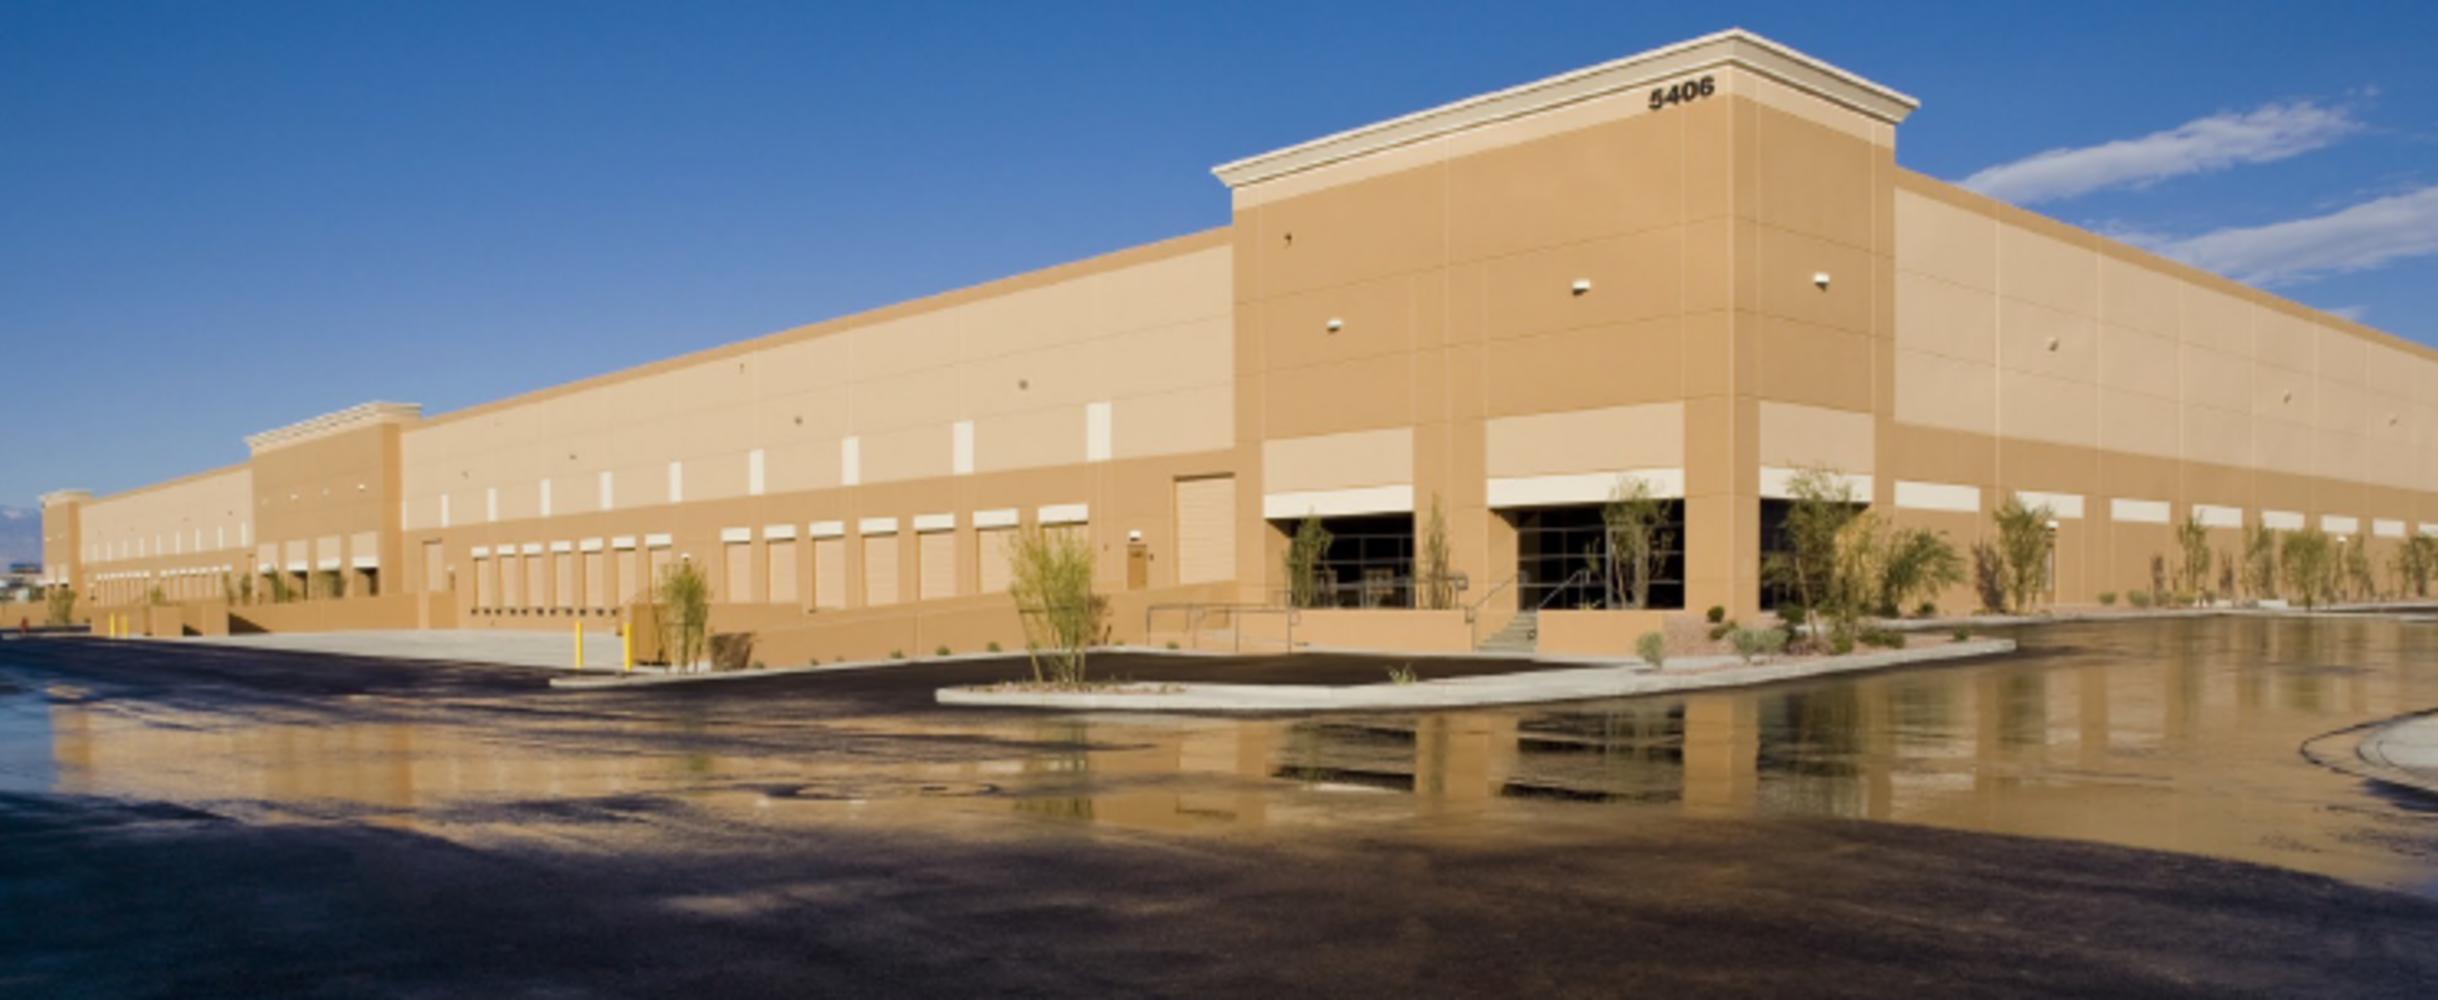 Industrial Las vegas, 89115 - Northern Beltway Industrial Center - Bldg B